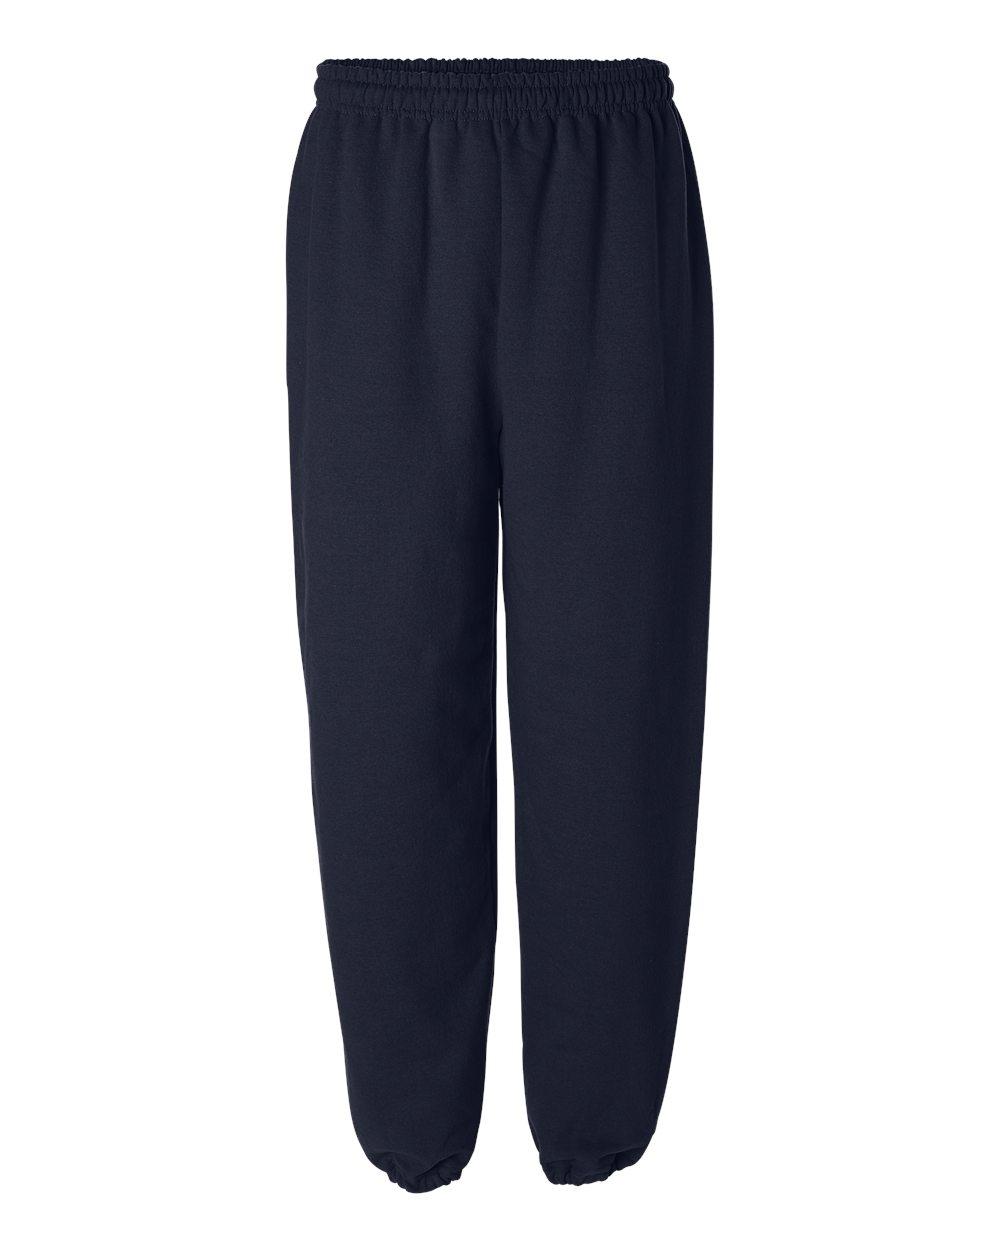 Gildan-Mens-Heavy-Blend-Sweatpants-18200-up-to-2XL thumbnail 12